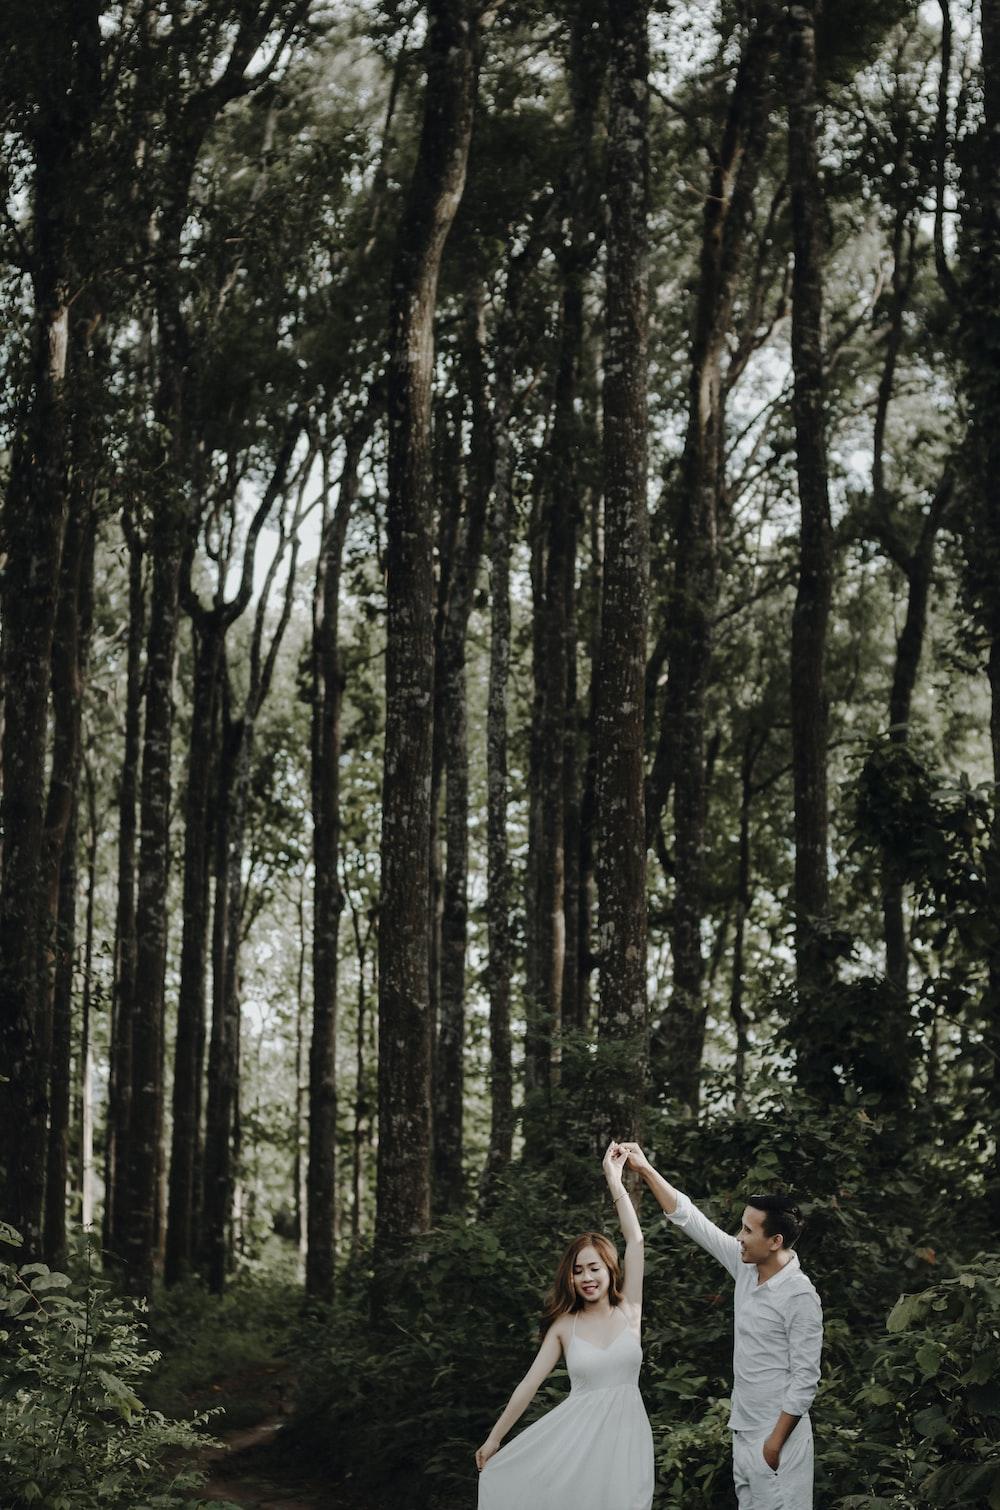 male and female dancing near tree